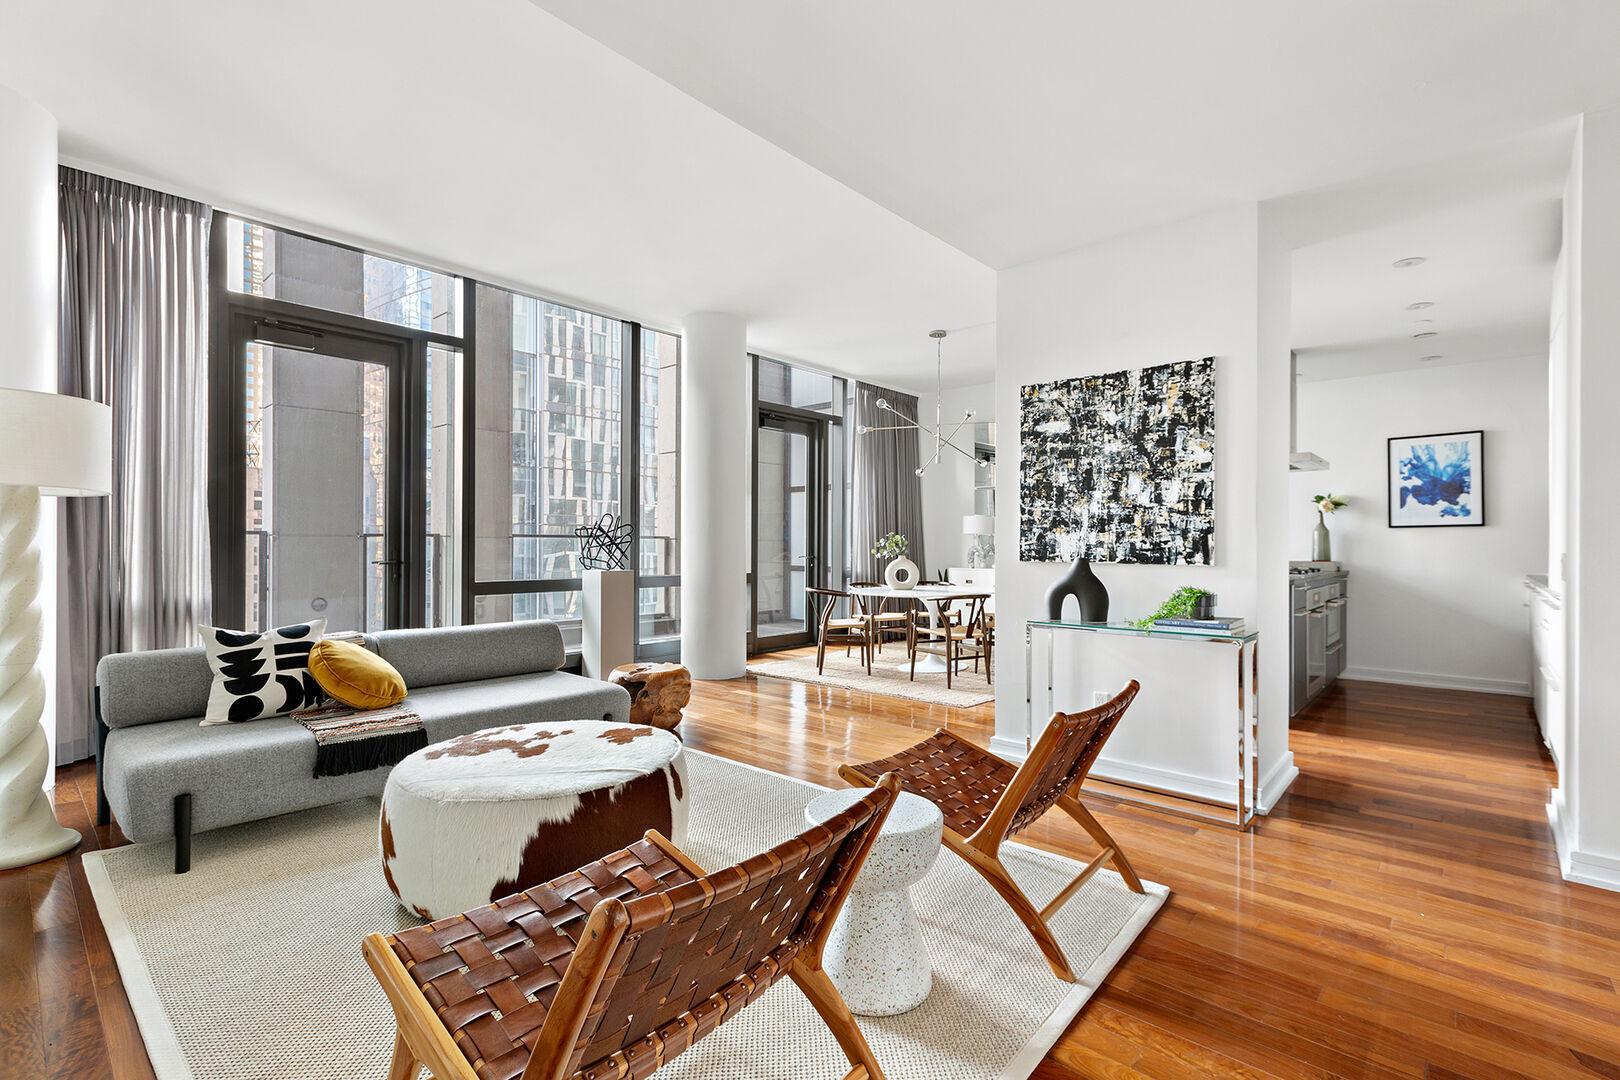 Apartment for sale at 101 Warren Street, Apt 9-H